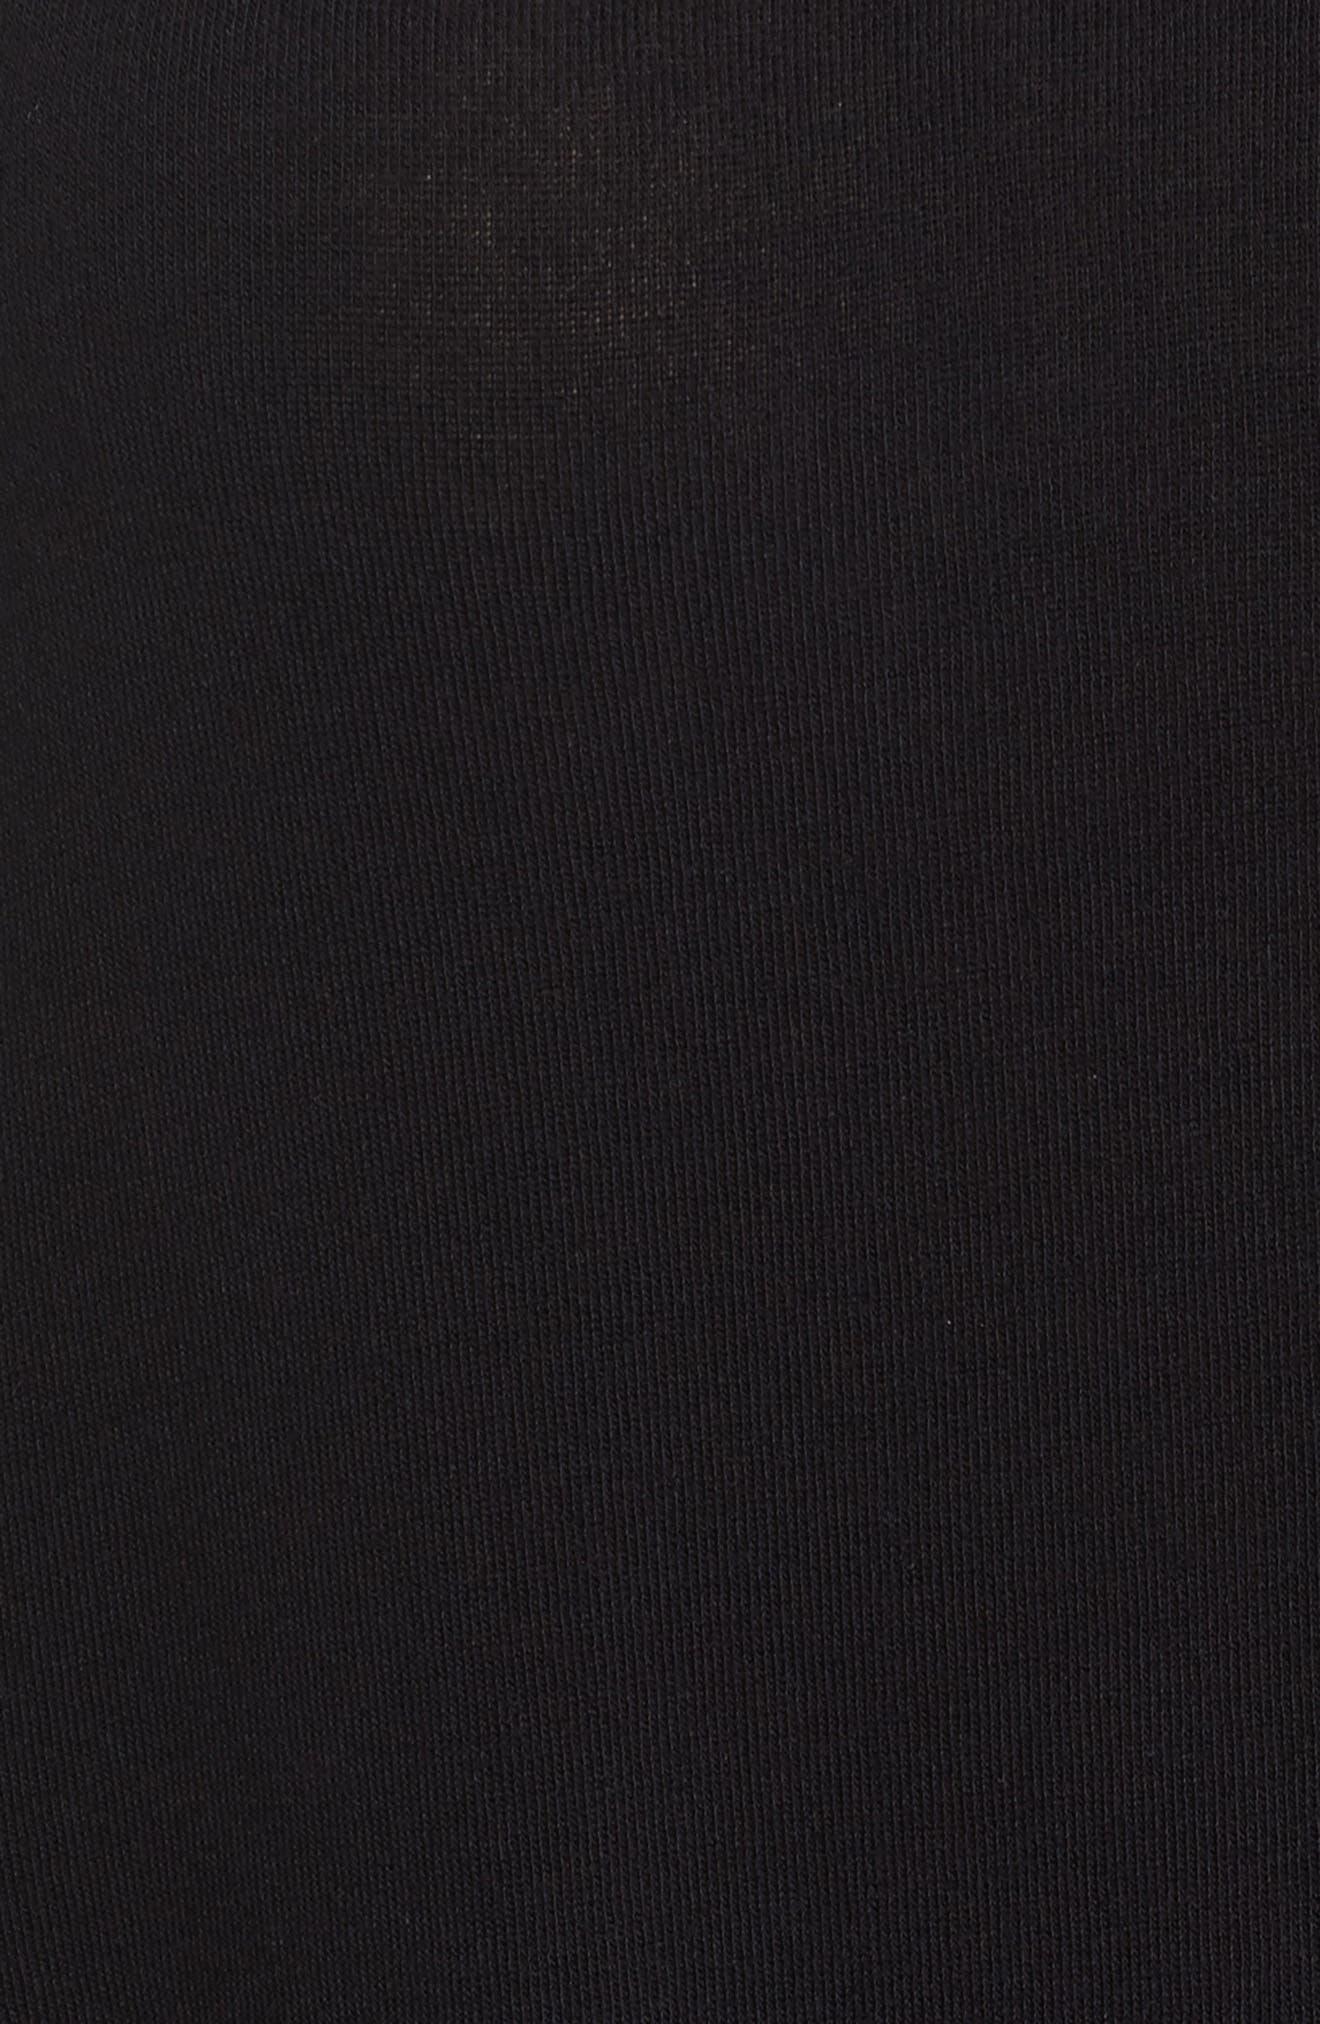 Stitch Detail Pullover,                             Alternate thumbnail 5, color,                             Black